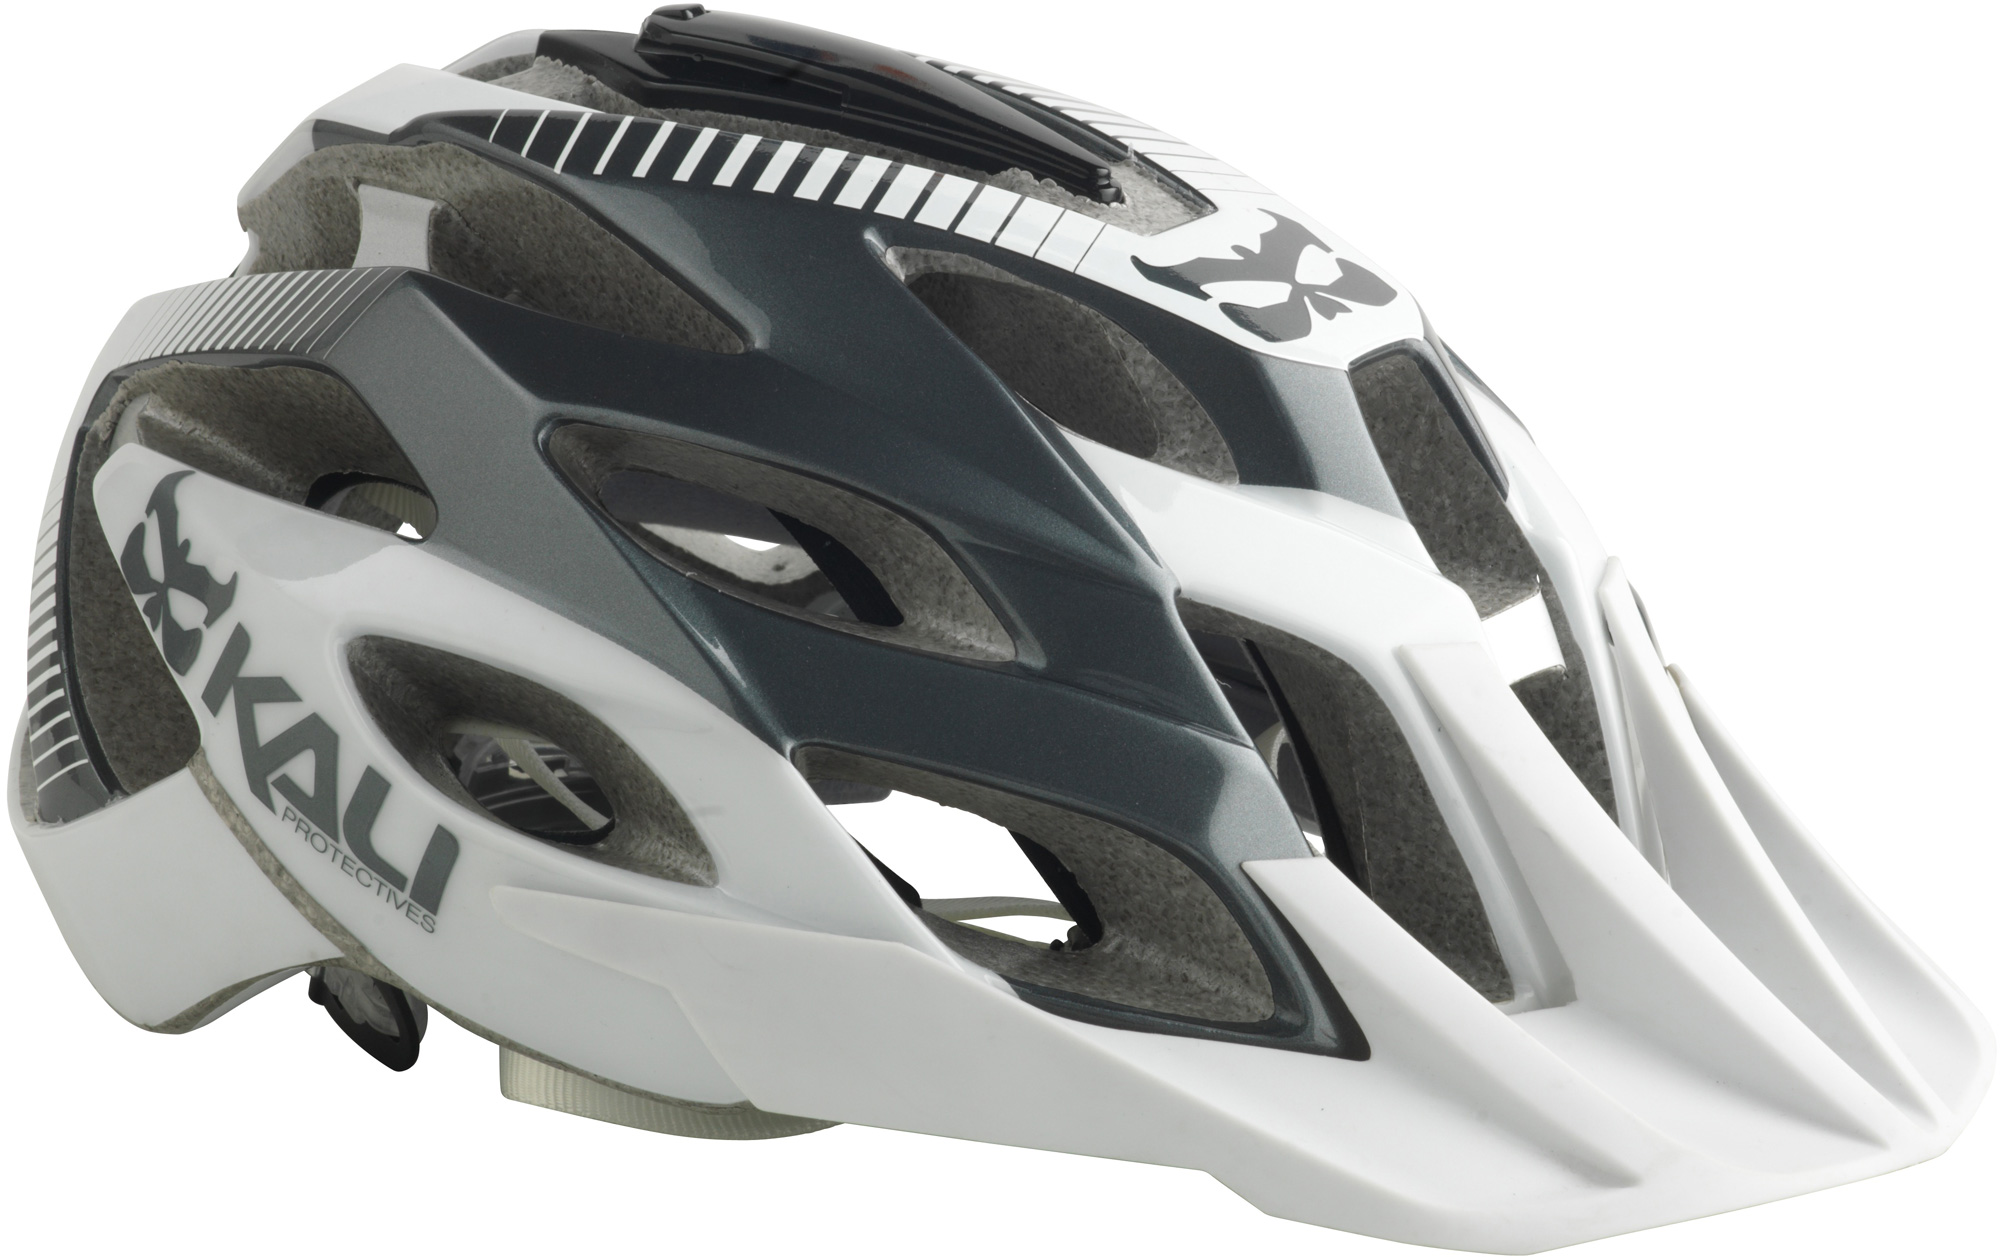 Kali Protectives Amara XC Helmet Cobra Black